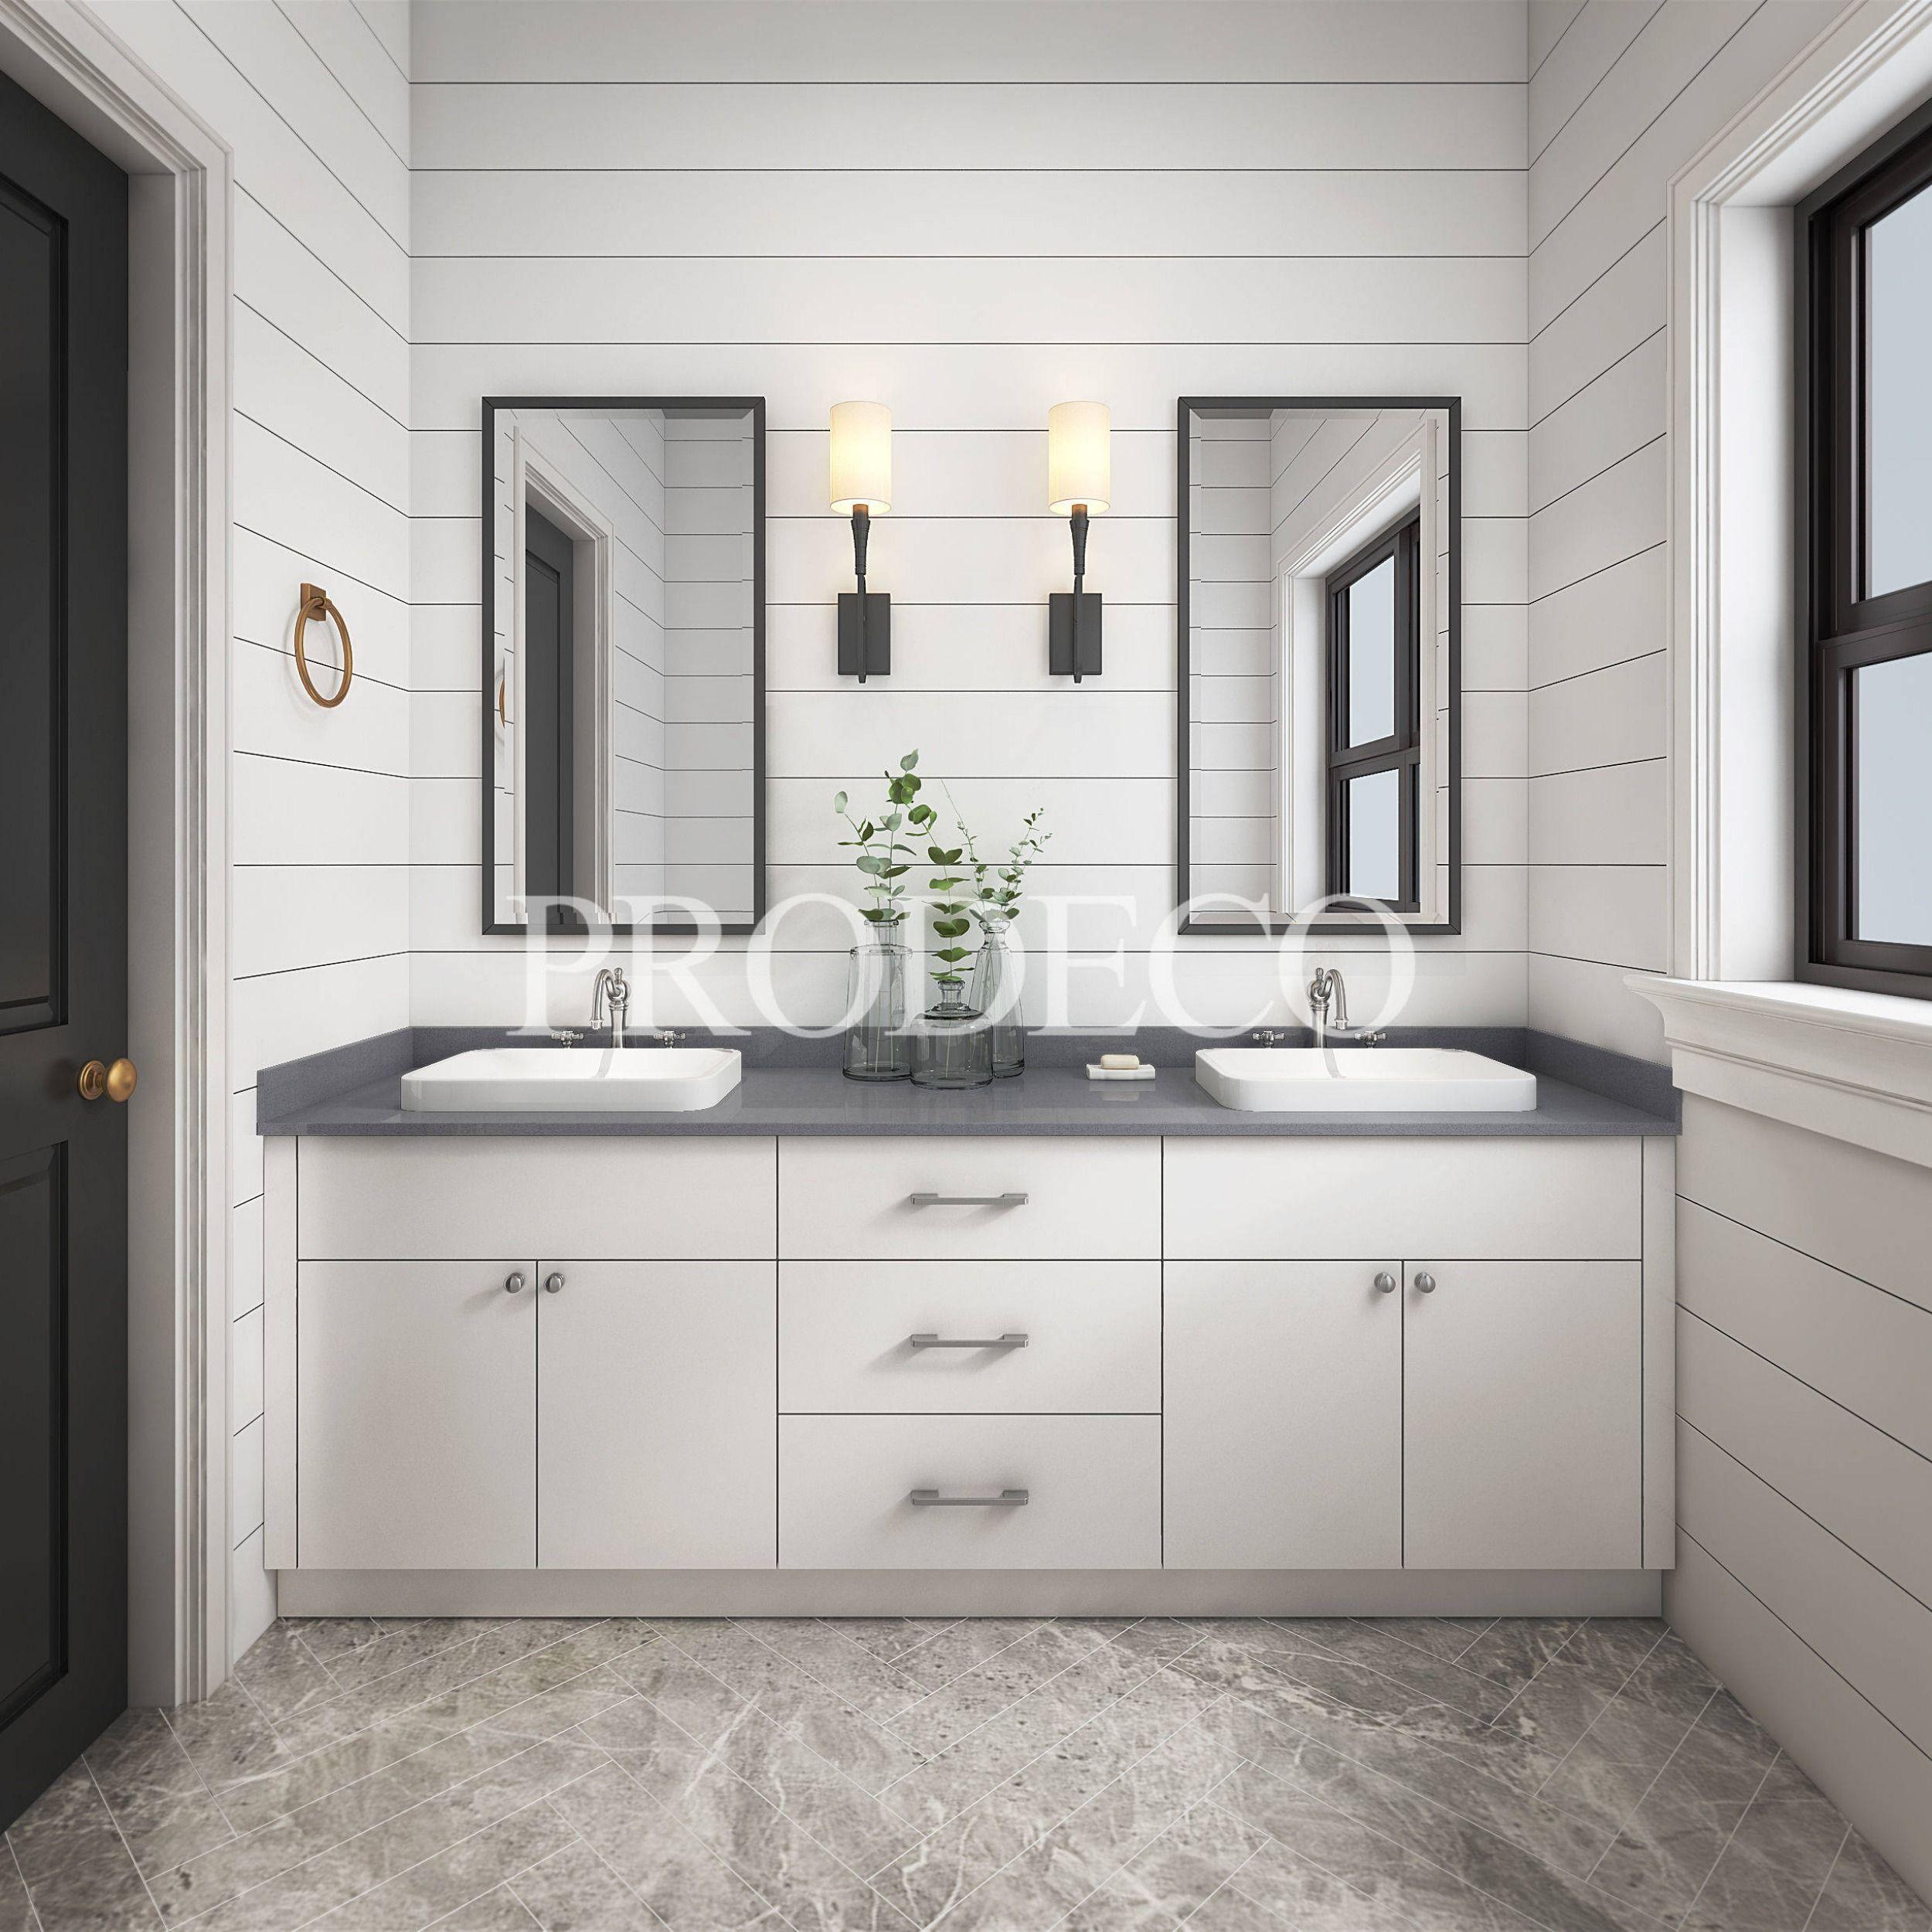 Solid Wood Hanging Bathroom Cabinets For Bathroom Projects Hanging Bathroom Cabinet Bathroom Cabinets Bathroom